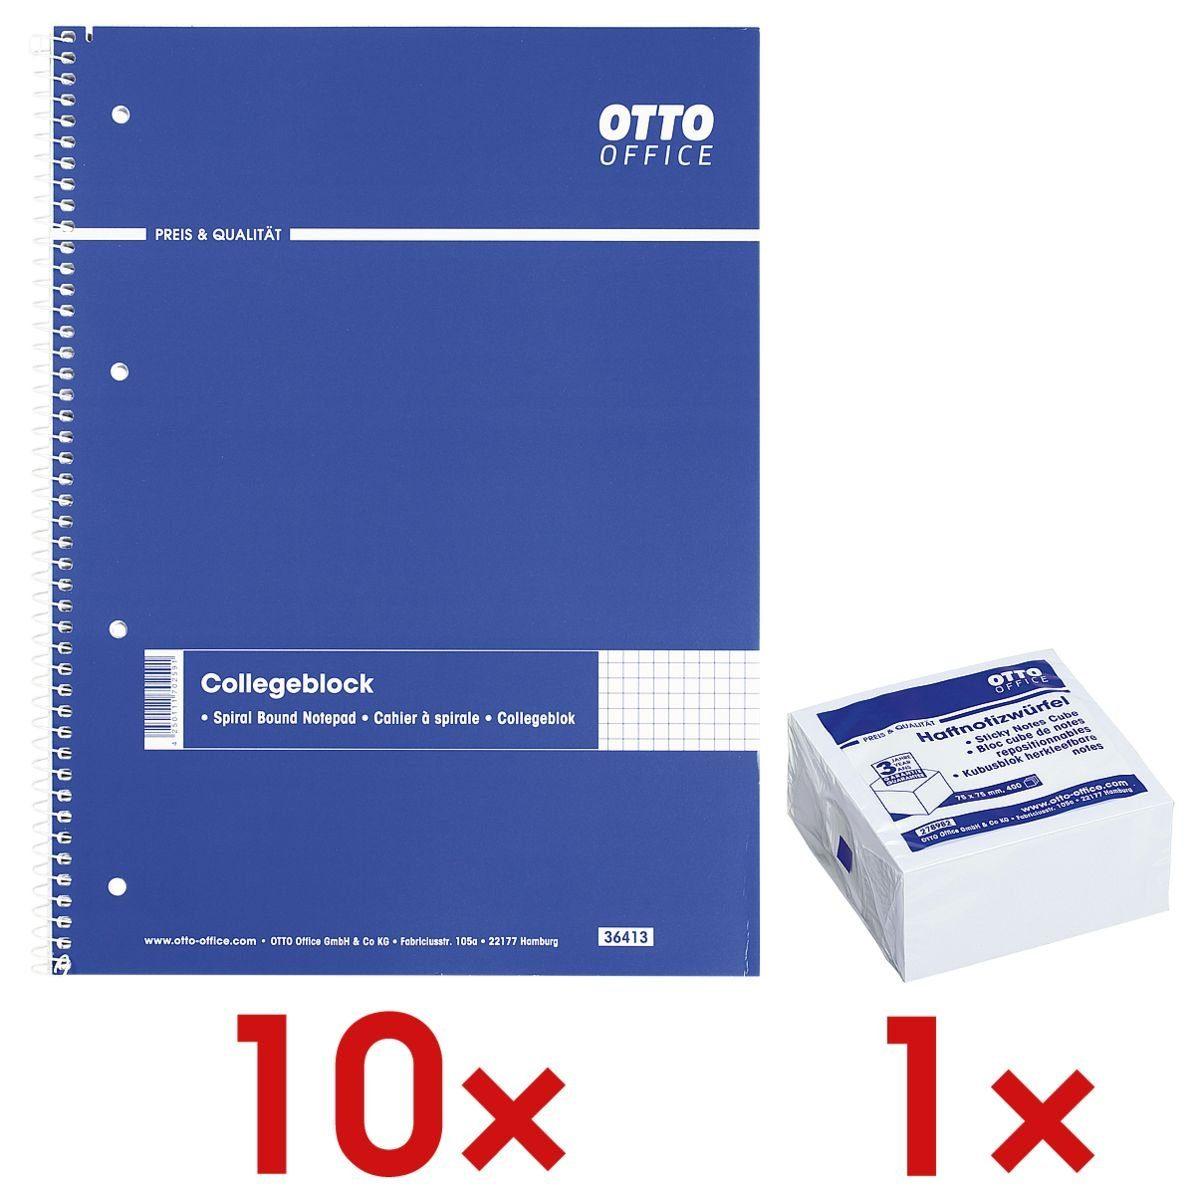 OTTOOFFICE STANDARD 10 Collegeblöcke A4 kariert inkl. 1 Haftnotizwürfel 1 Set